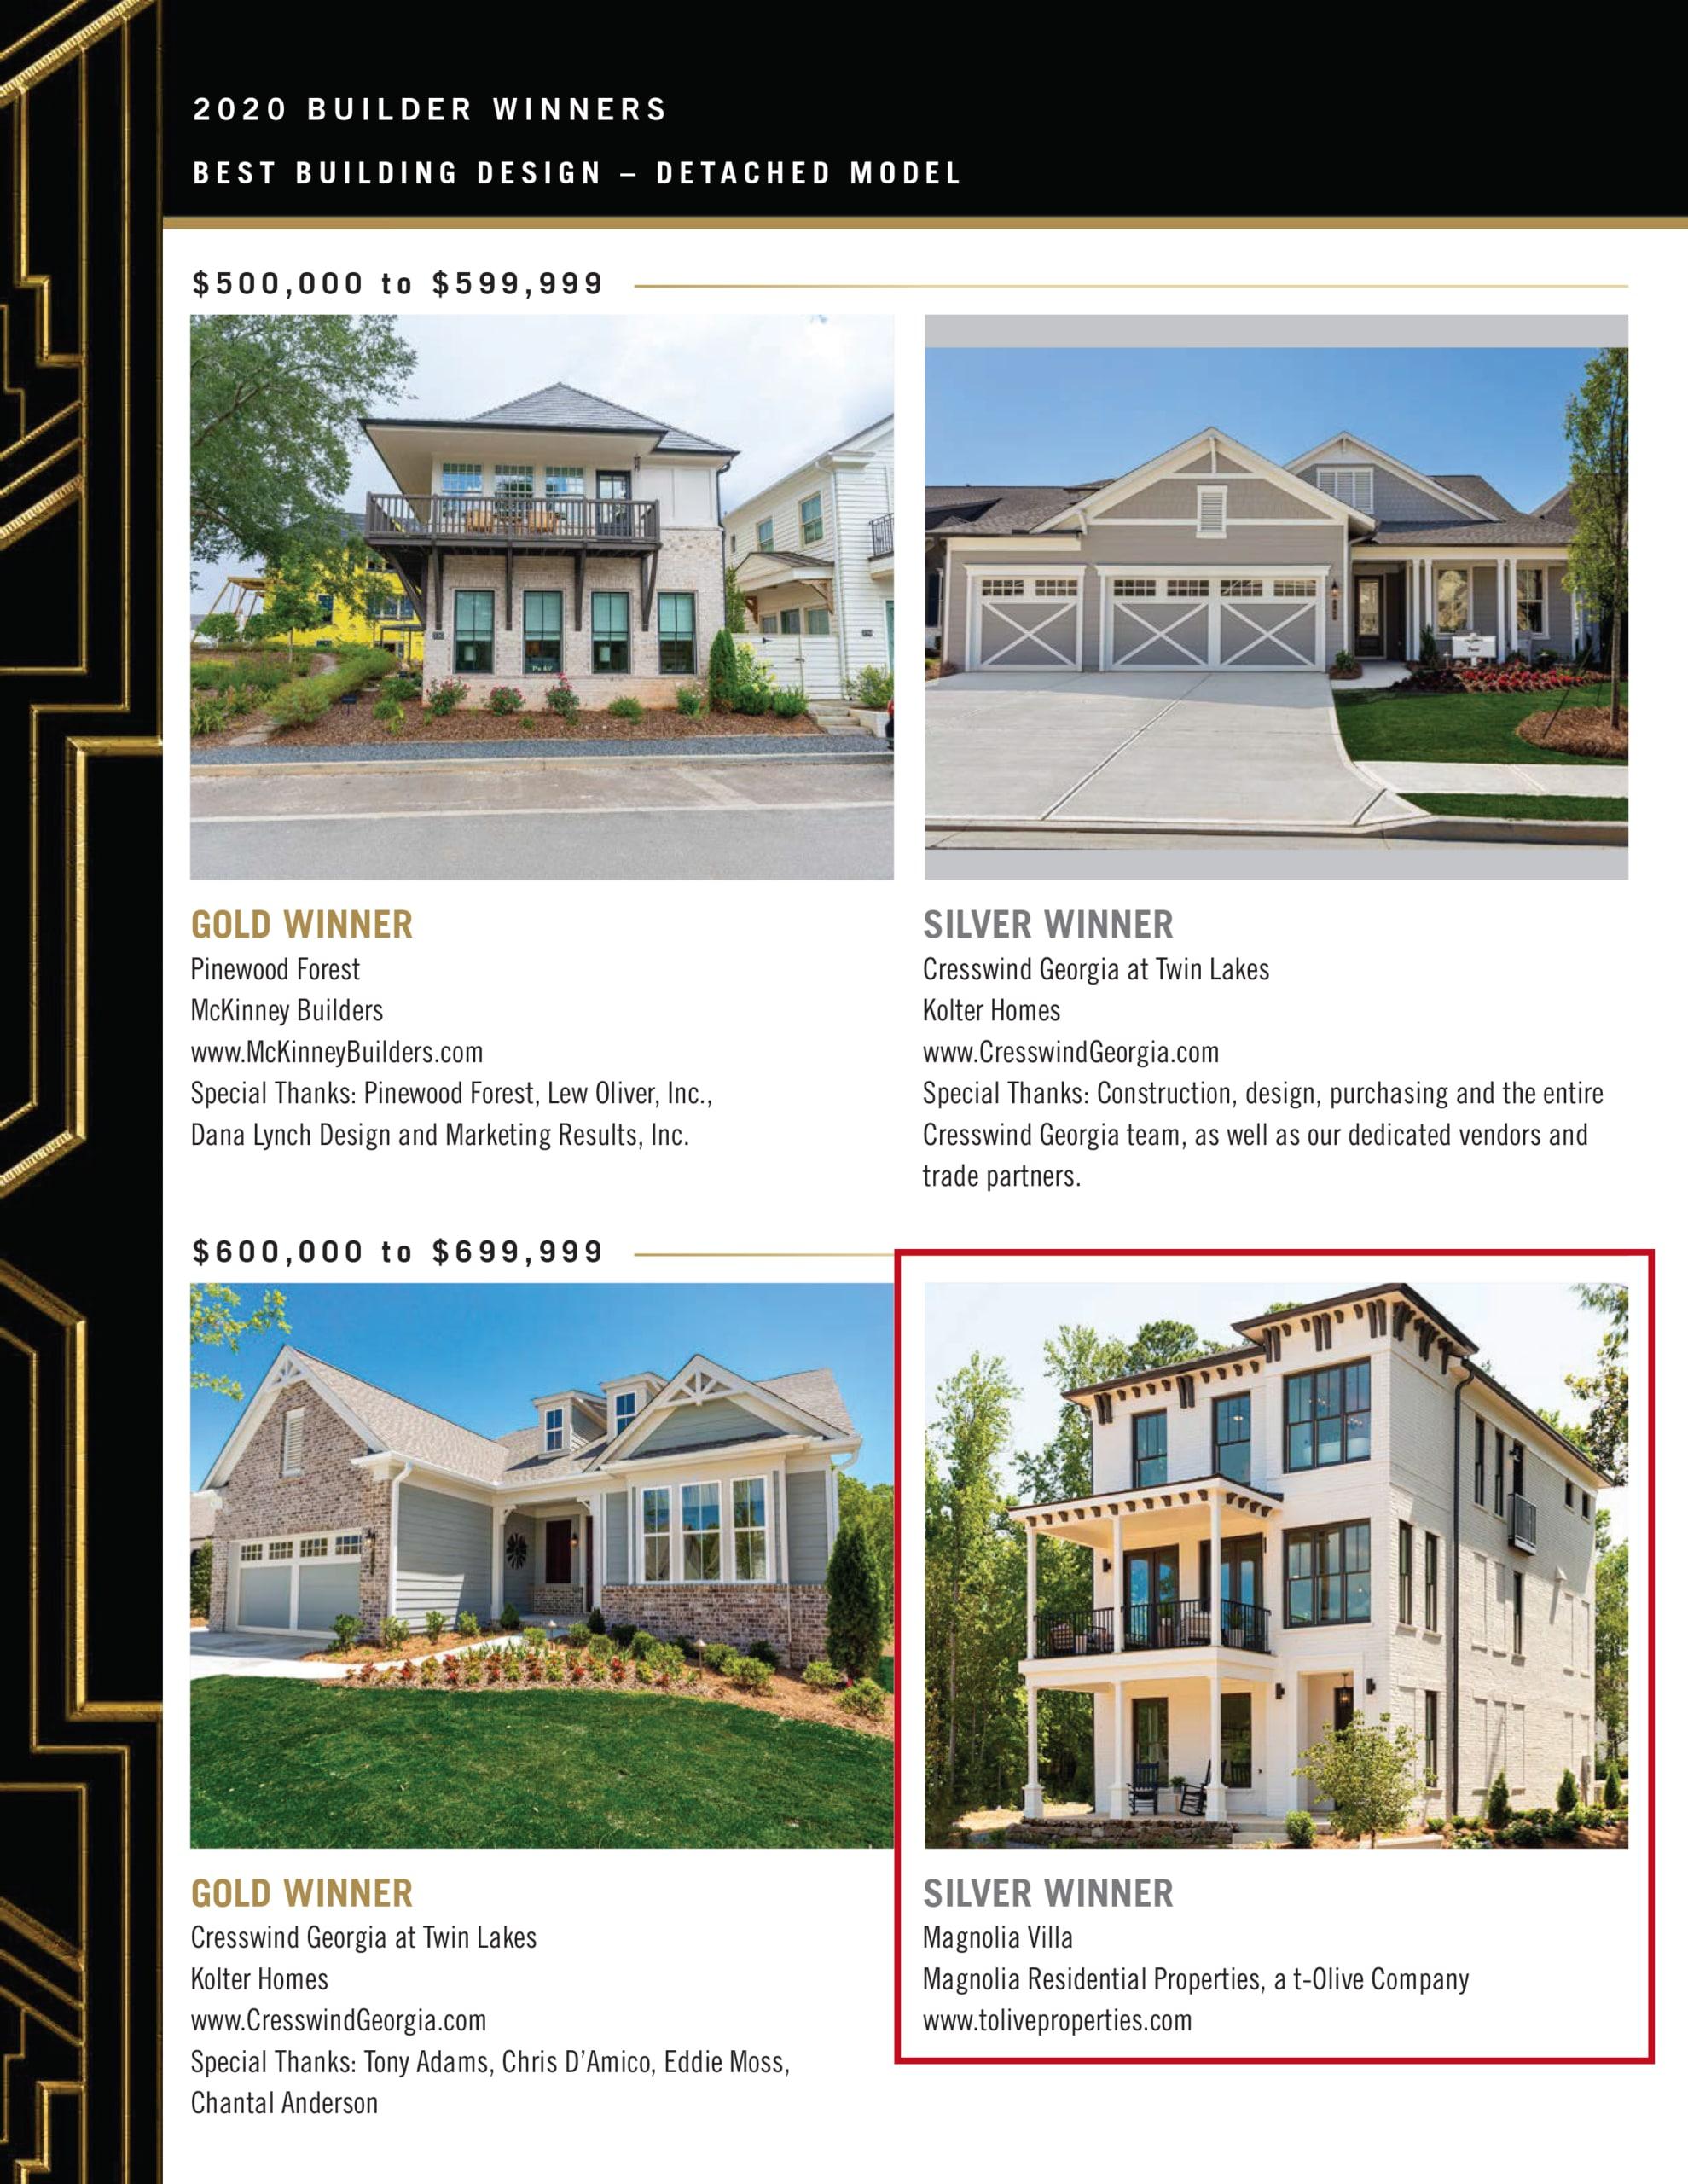 Villa Magnolia Obie Award Winning Home